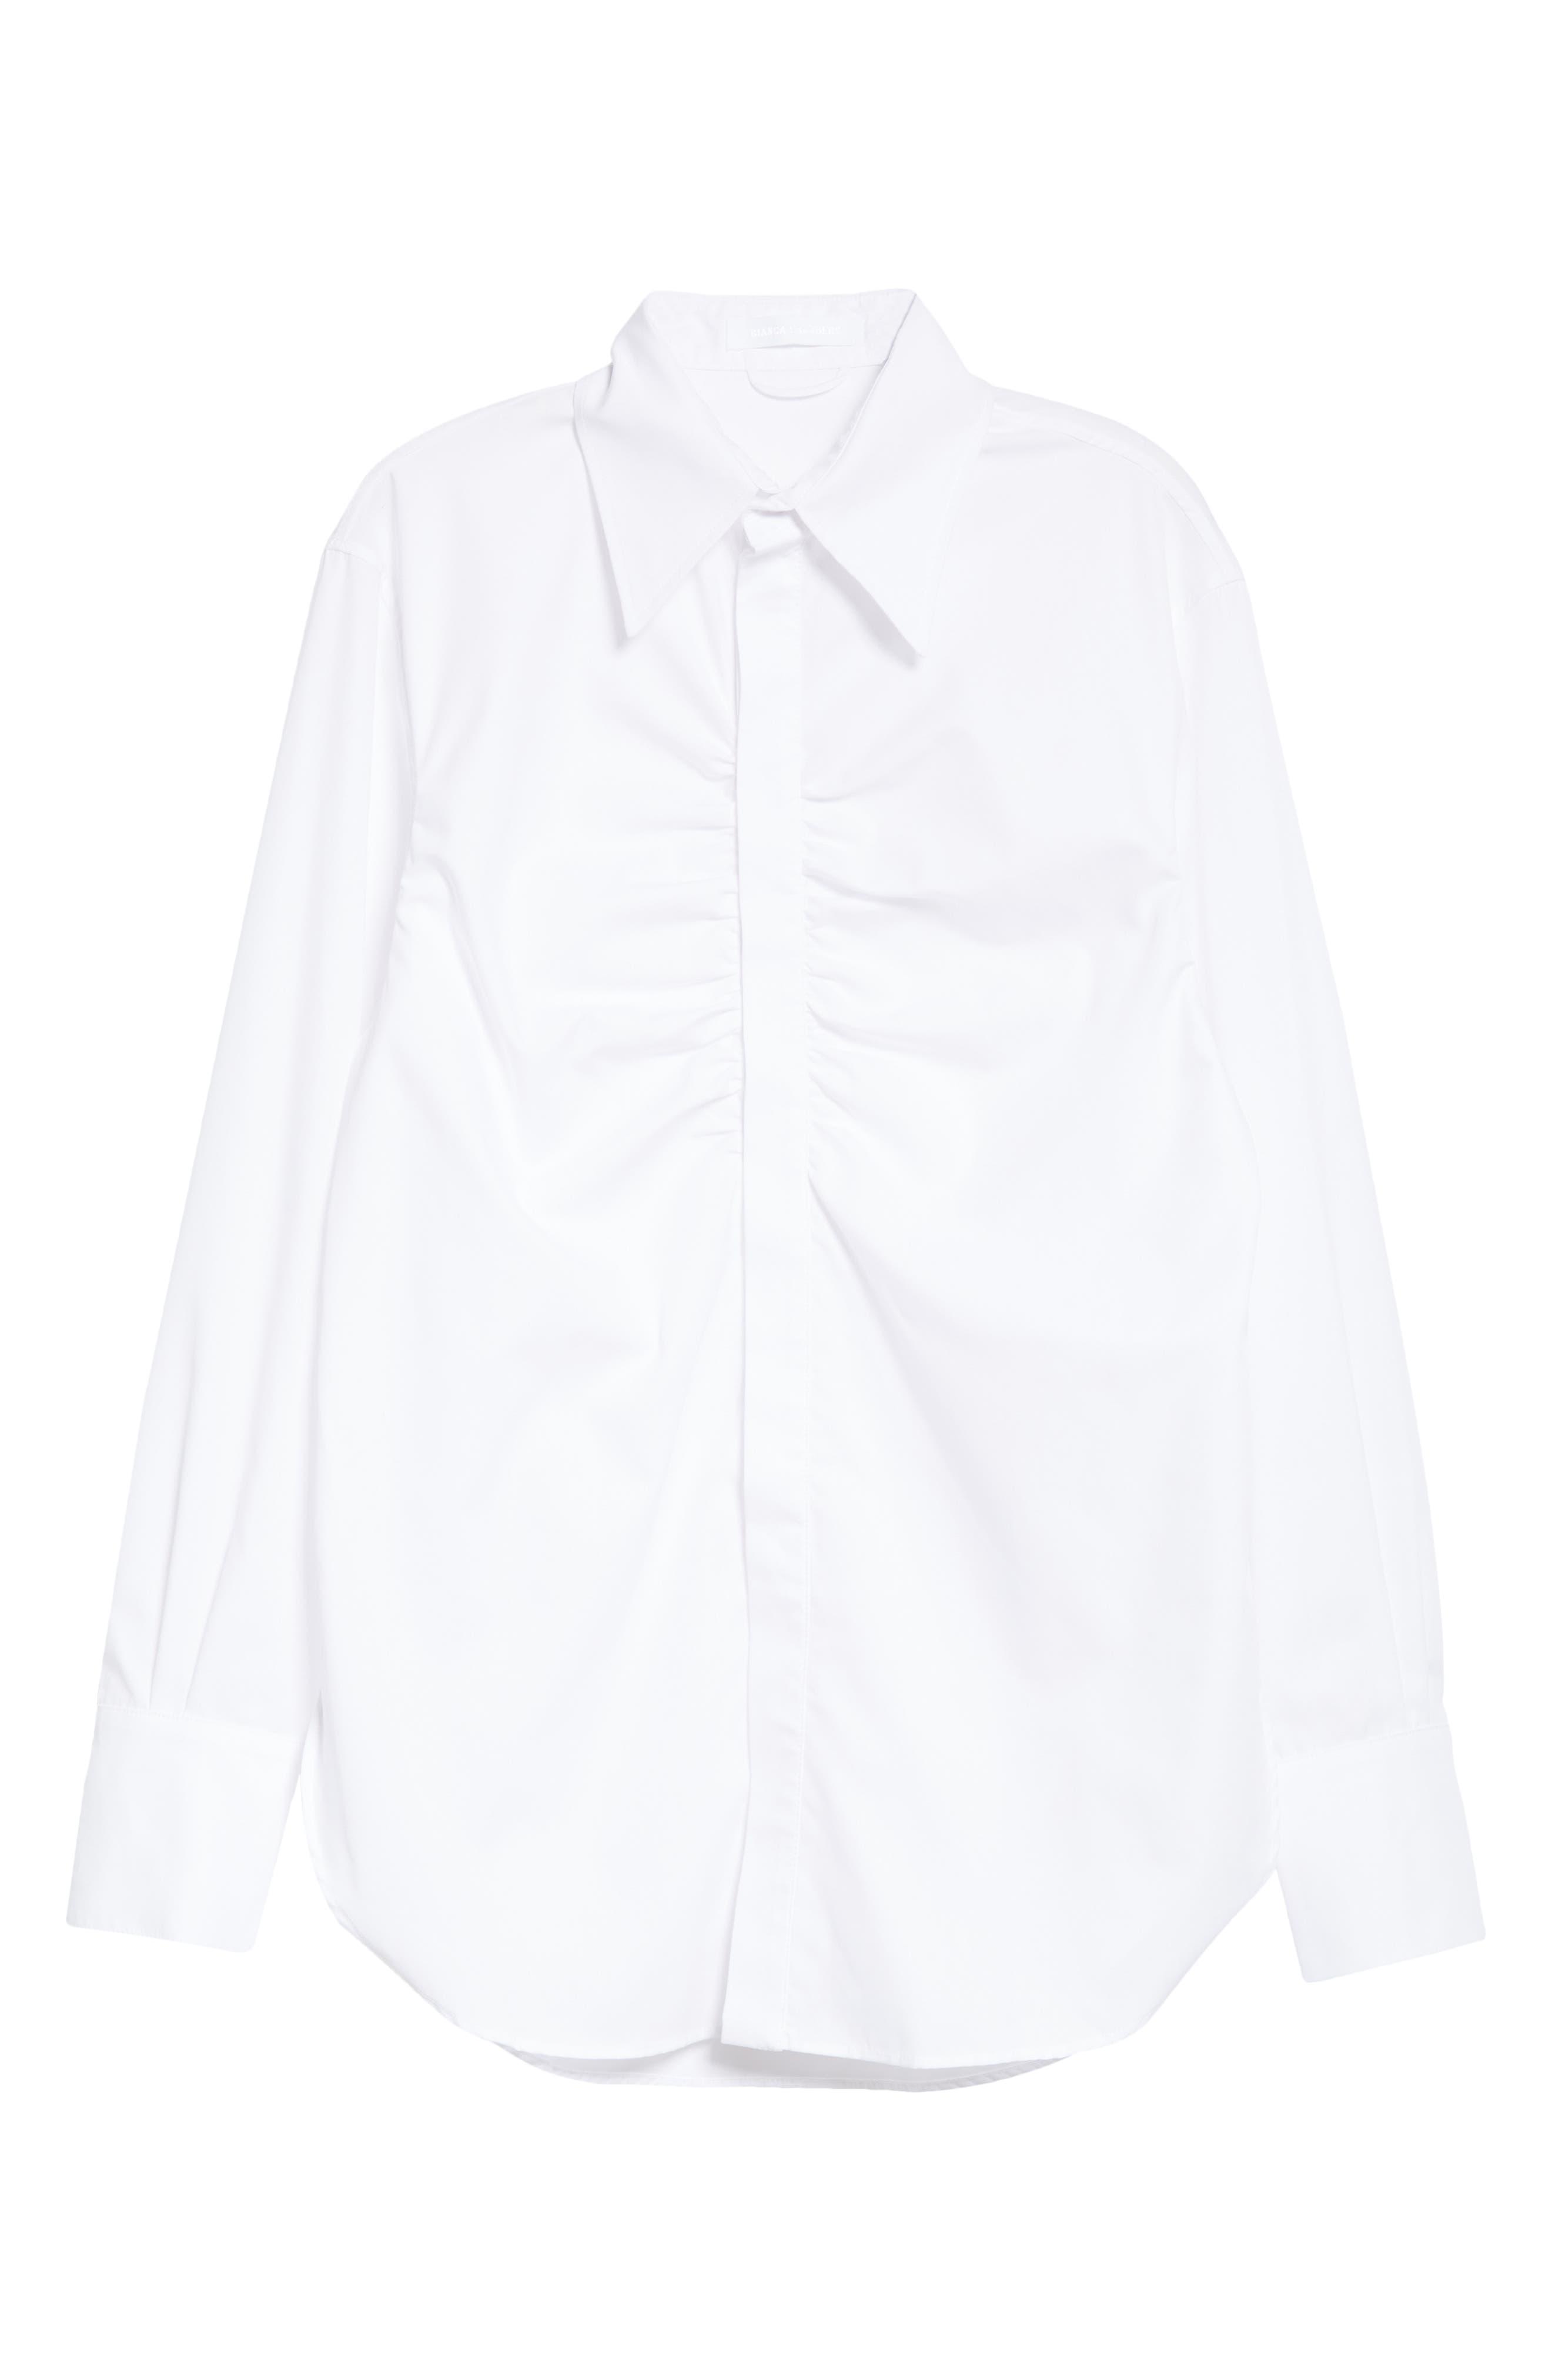 Tense Ruched Button-Up Shirt